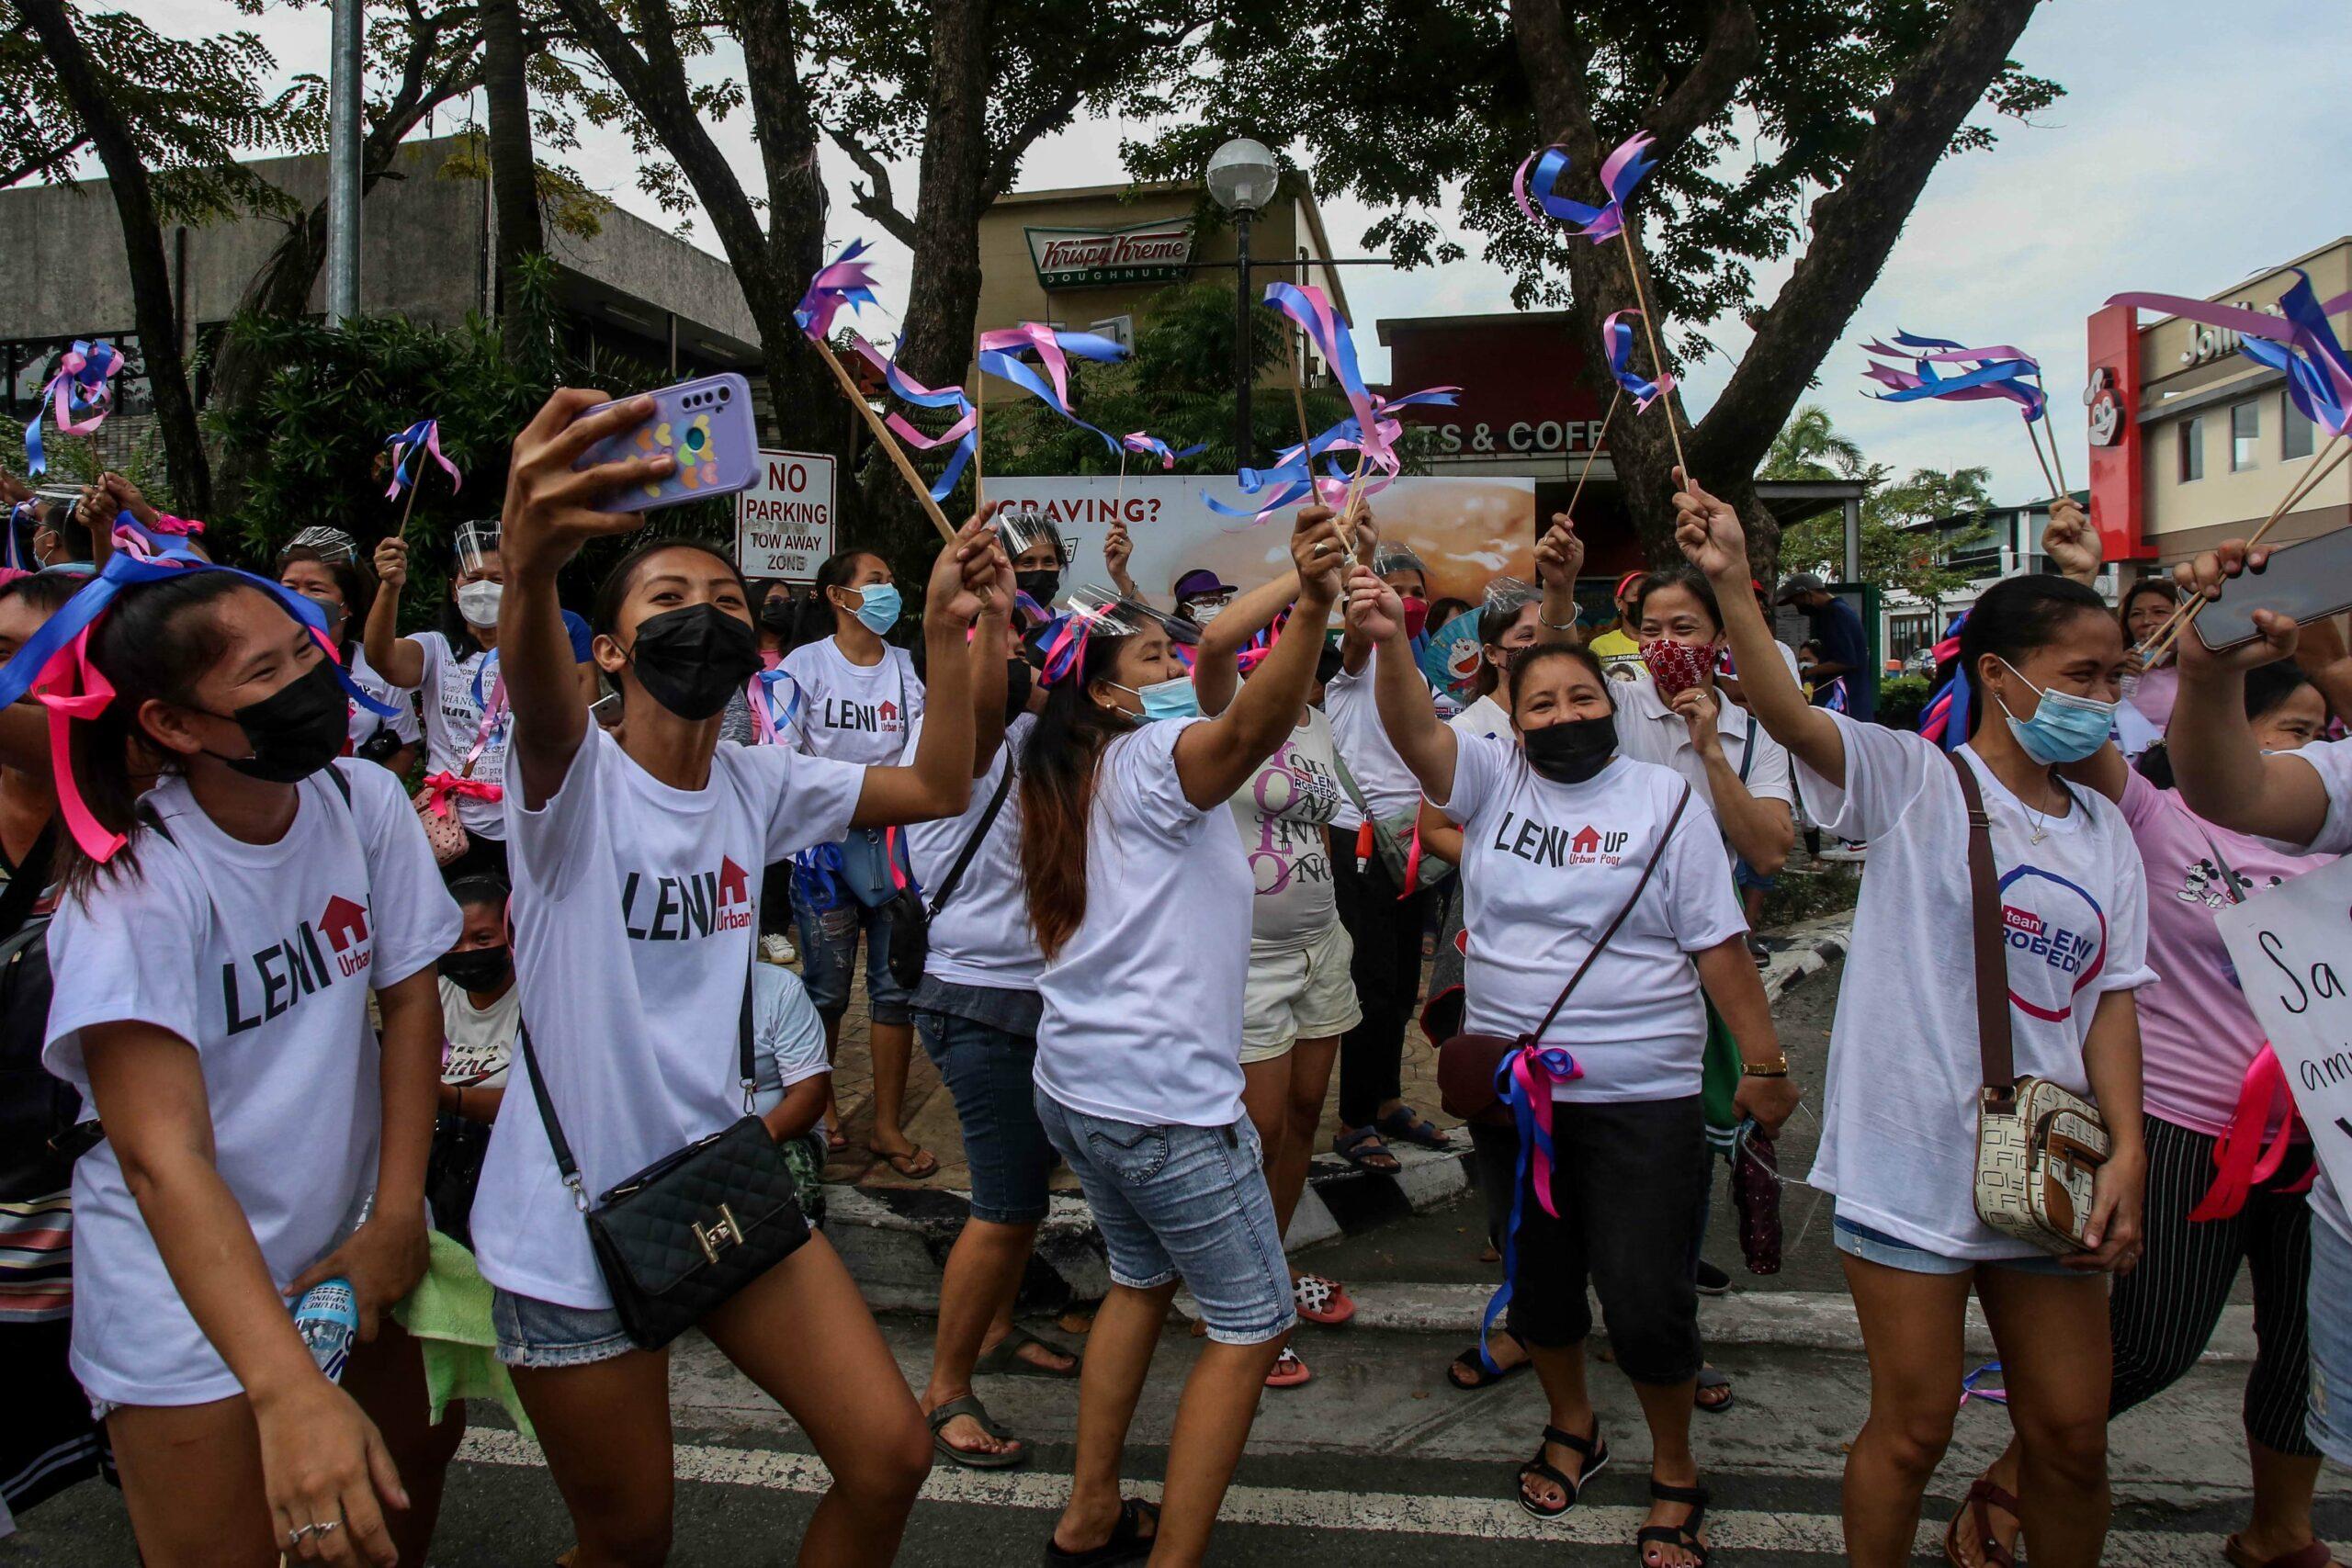 Duterte nemesis and drug-war critic bids for Philippine president